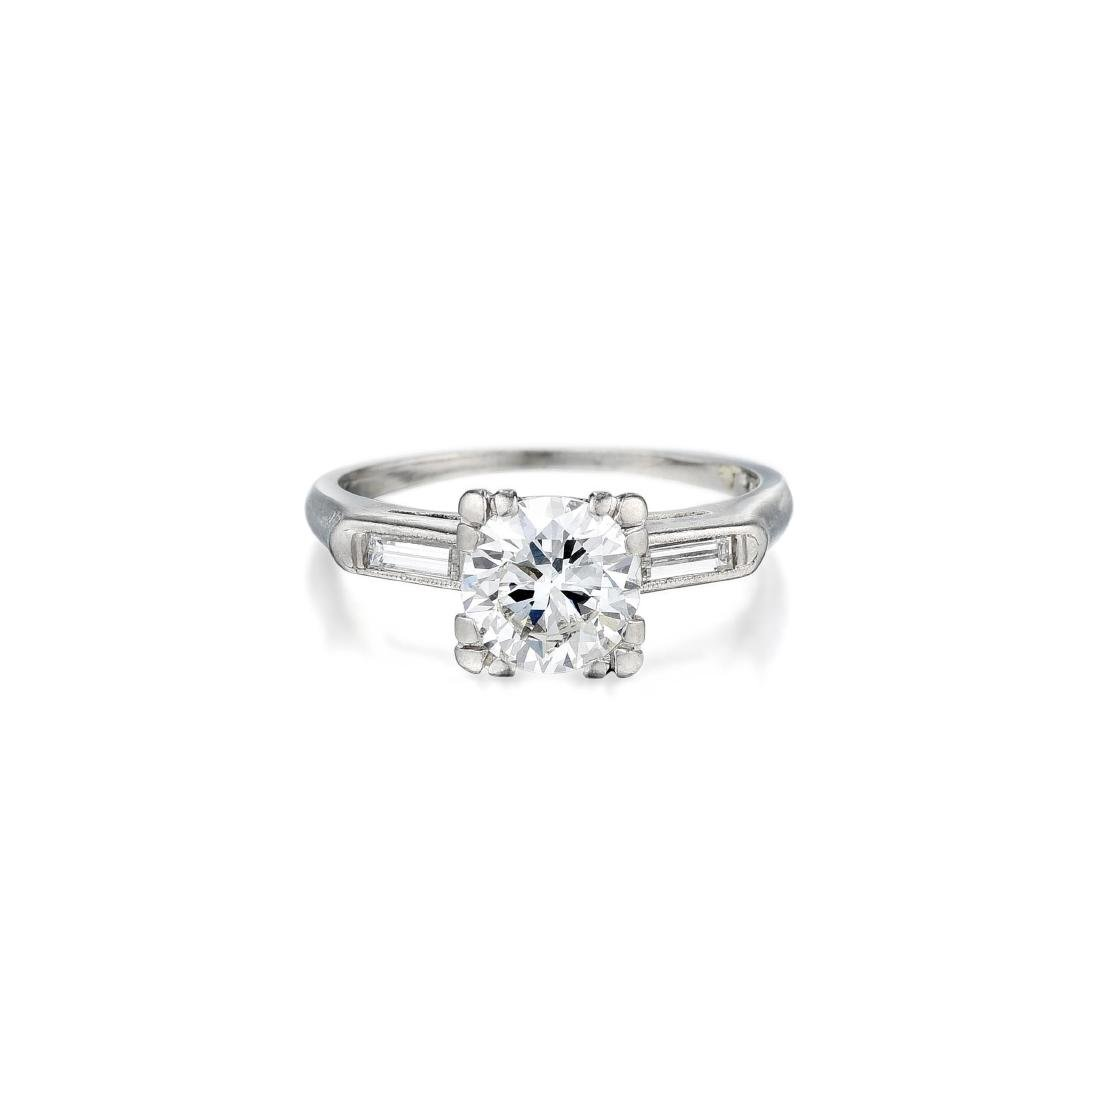 A Diamond Platinum Ring